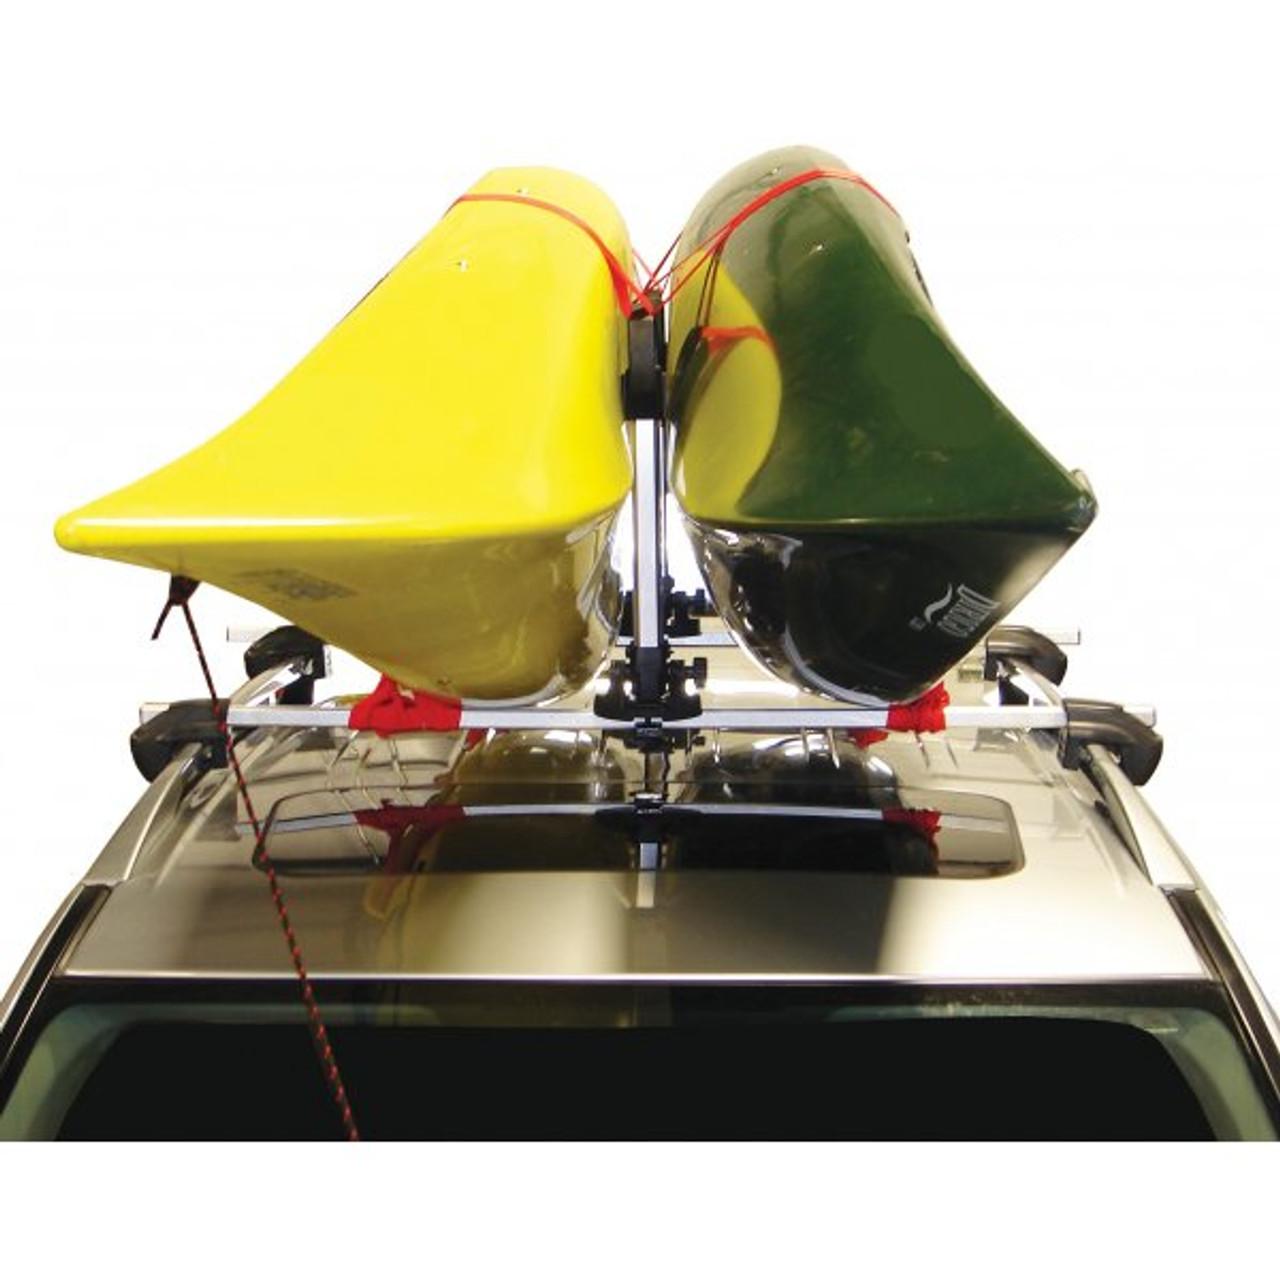 Inno Roof Rack >> Double Kayak Roof Rack | Holds 2 Kayaks - StoreYourBoard.com